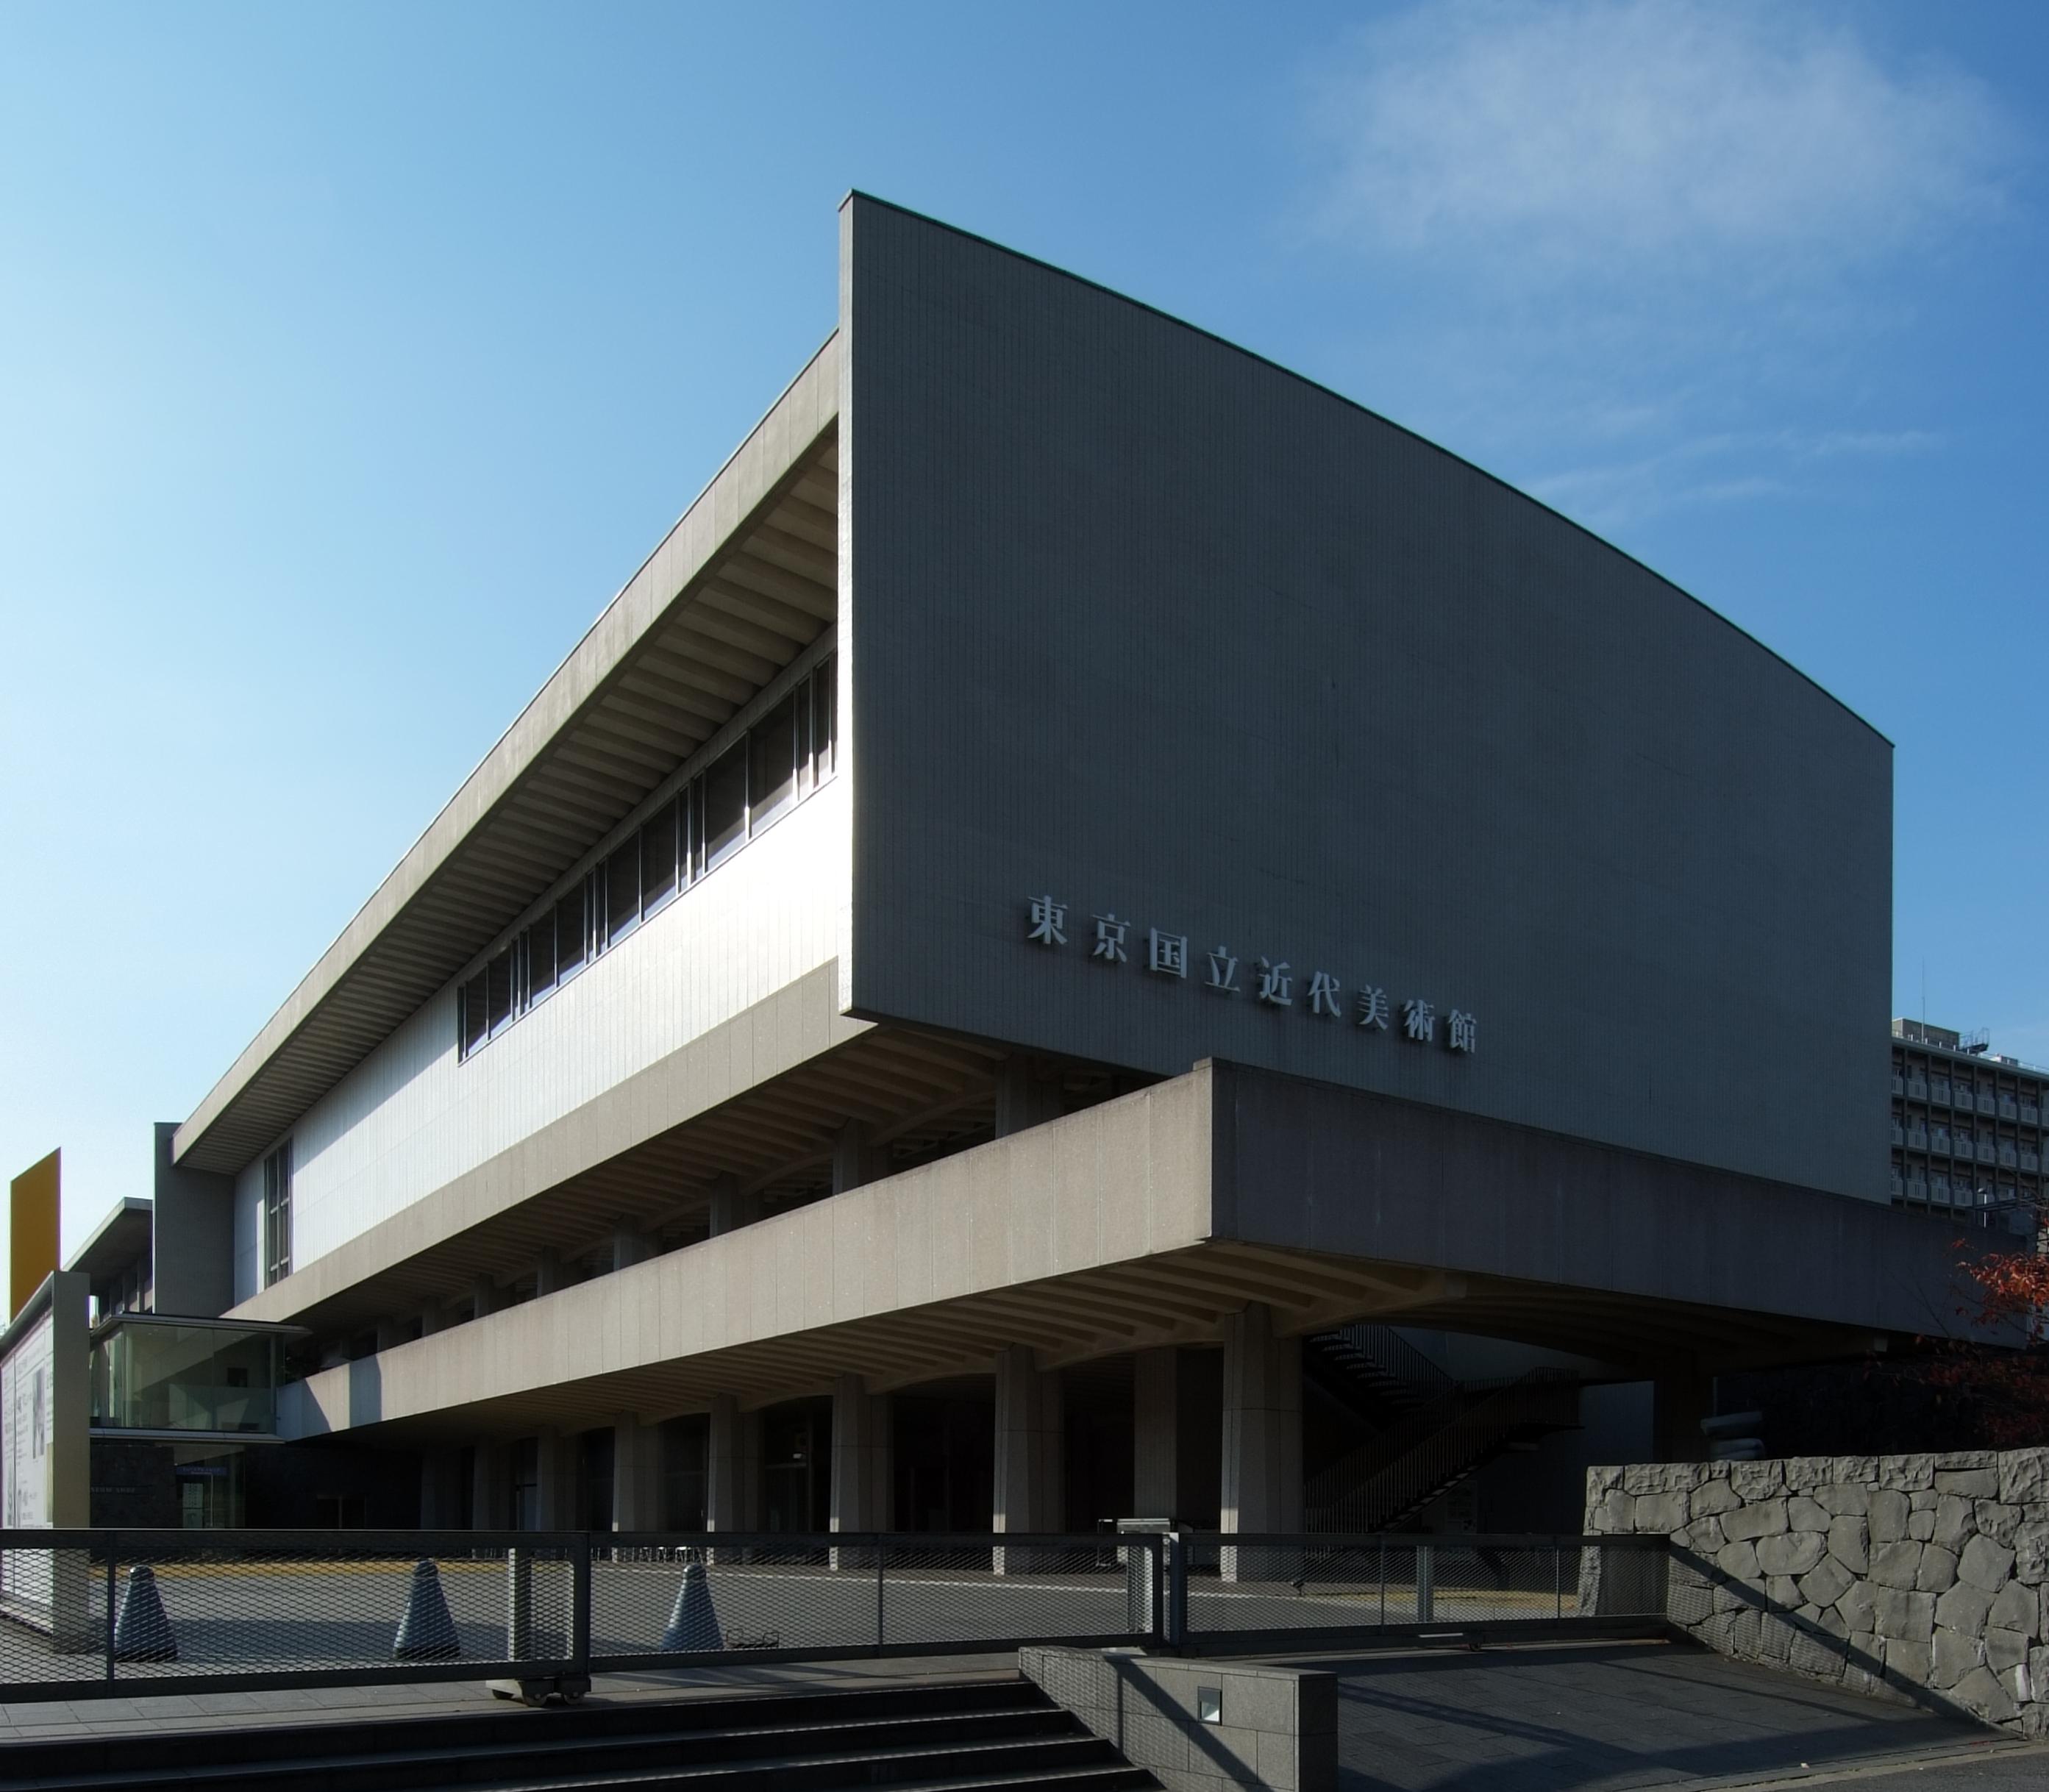 http://upload.wikimedia.org/wikipedia/commons/5/5c/National_Museum_of_Modern_Art,_Tokyo.jpg